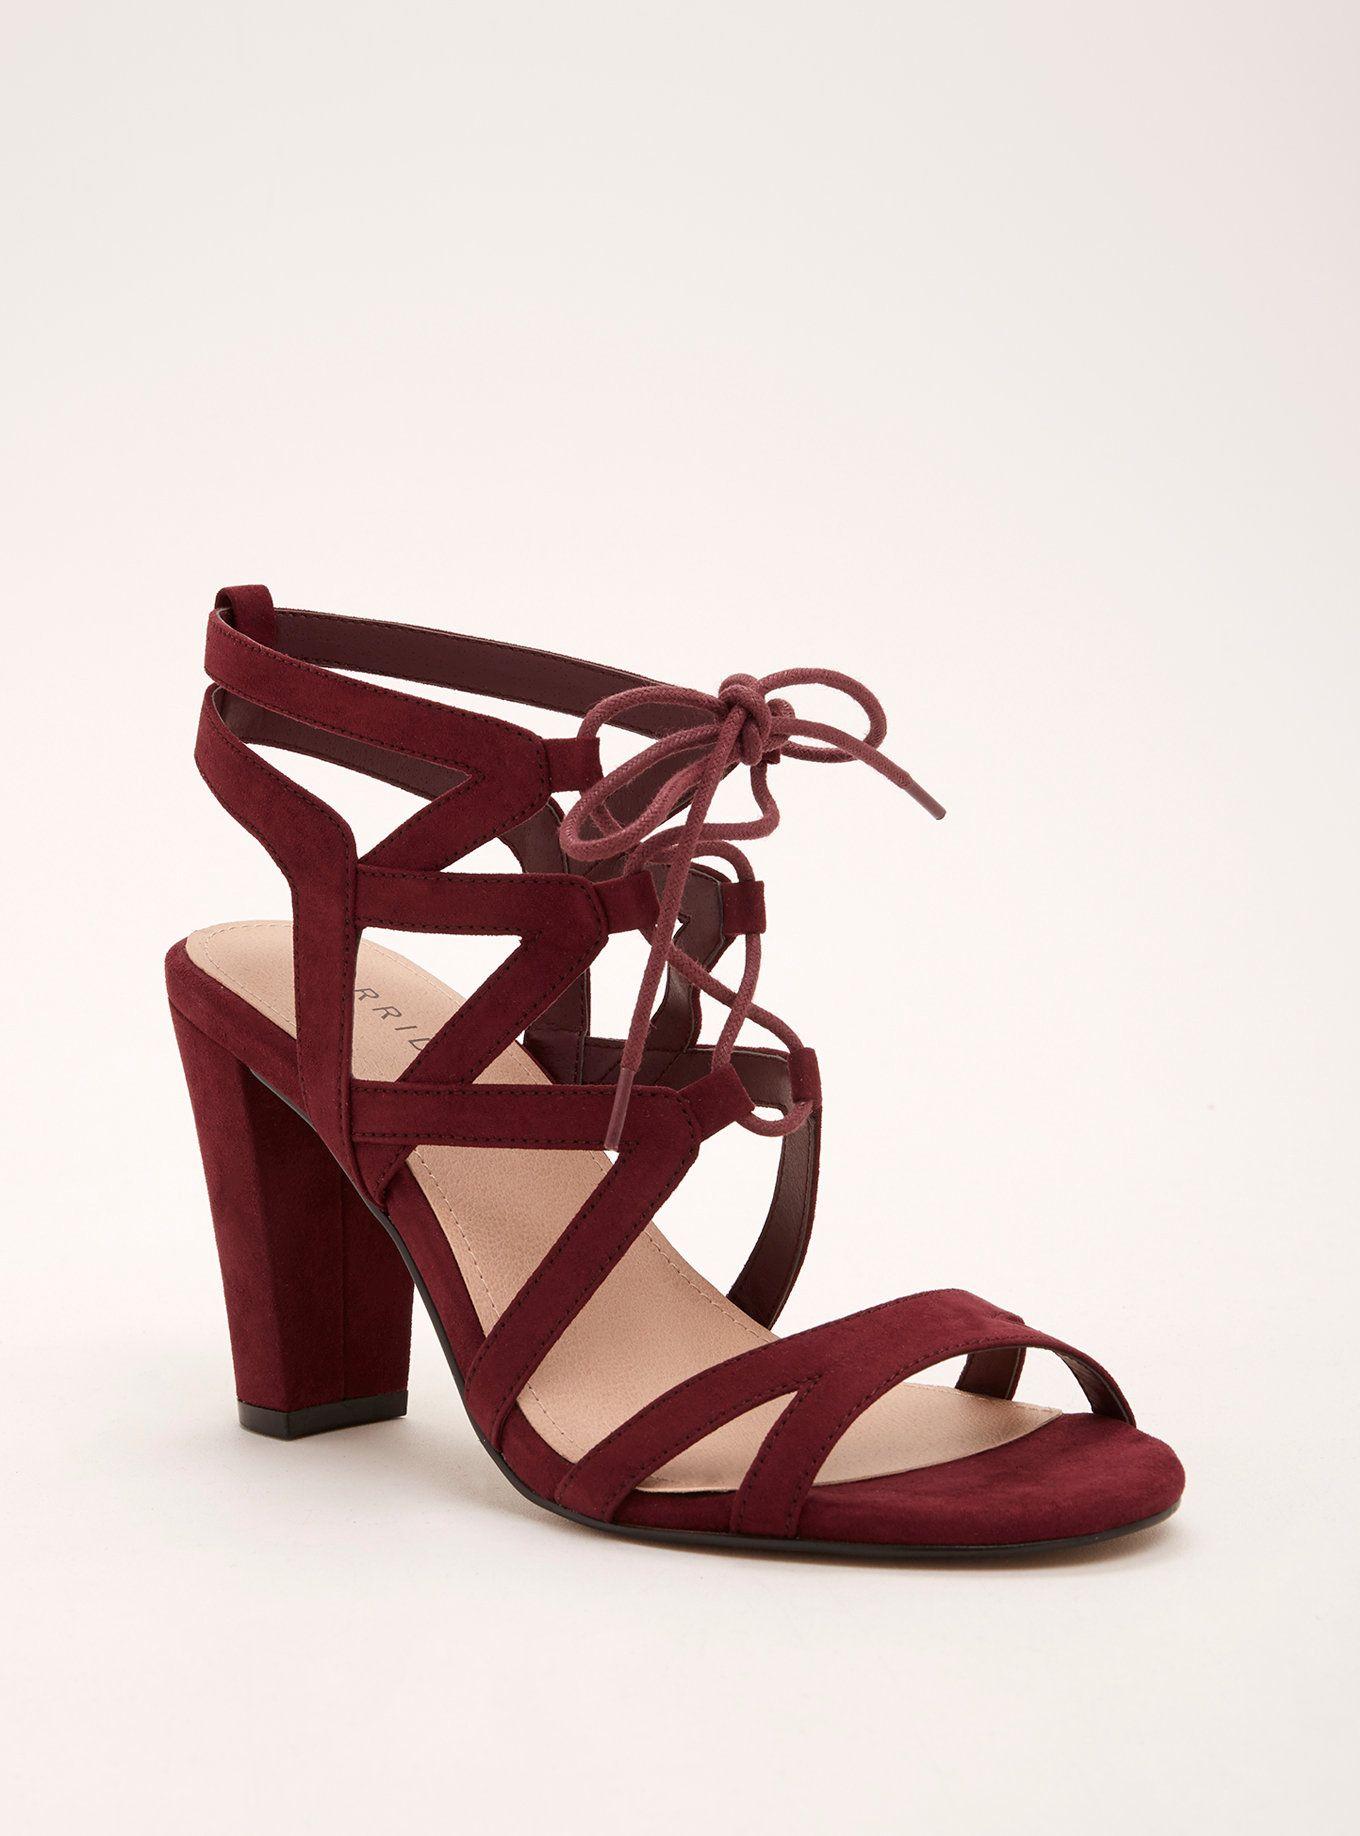 94f3c782f1a4 Lace Up Block Heels (Wide Width)